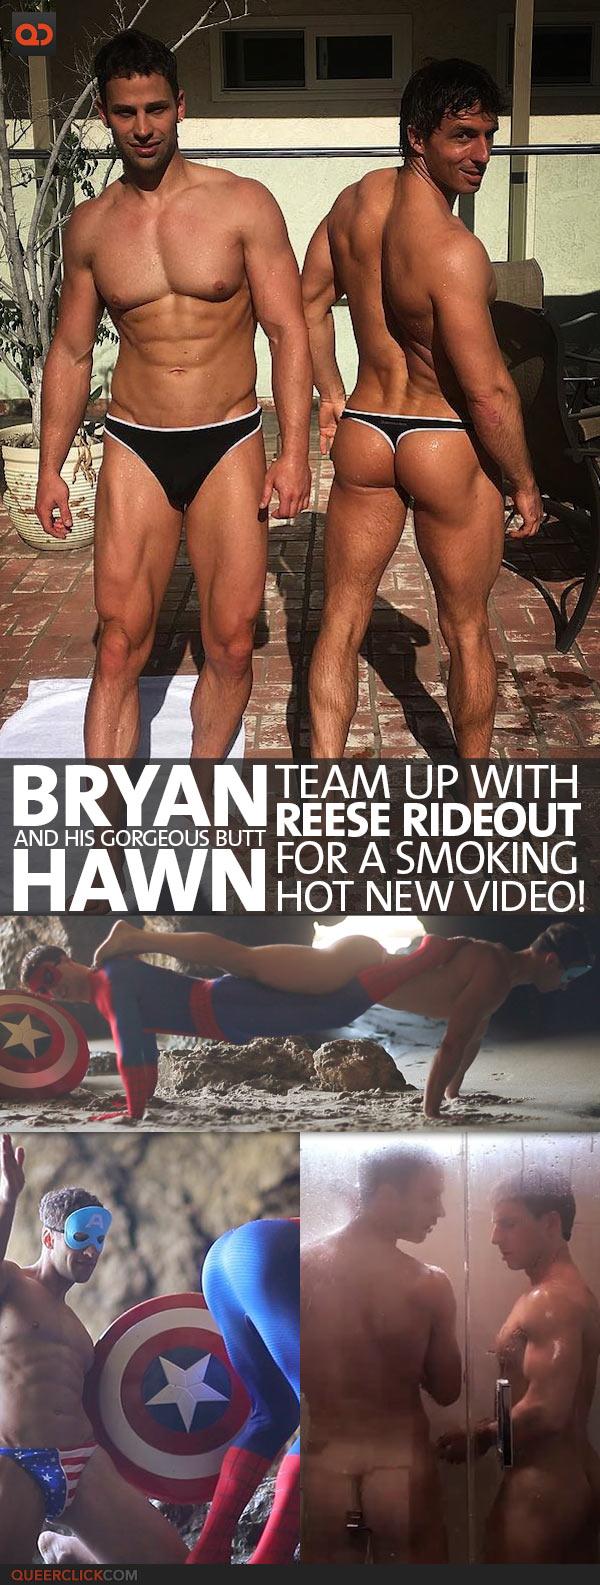 Bryan hawn naked